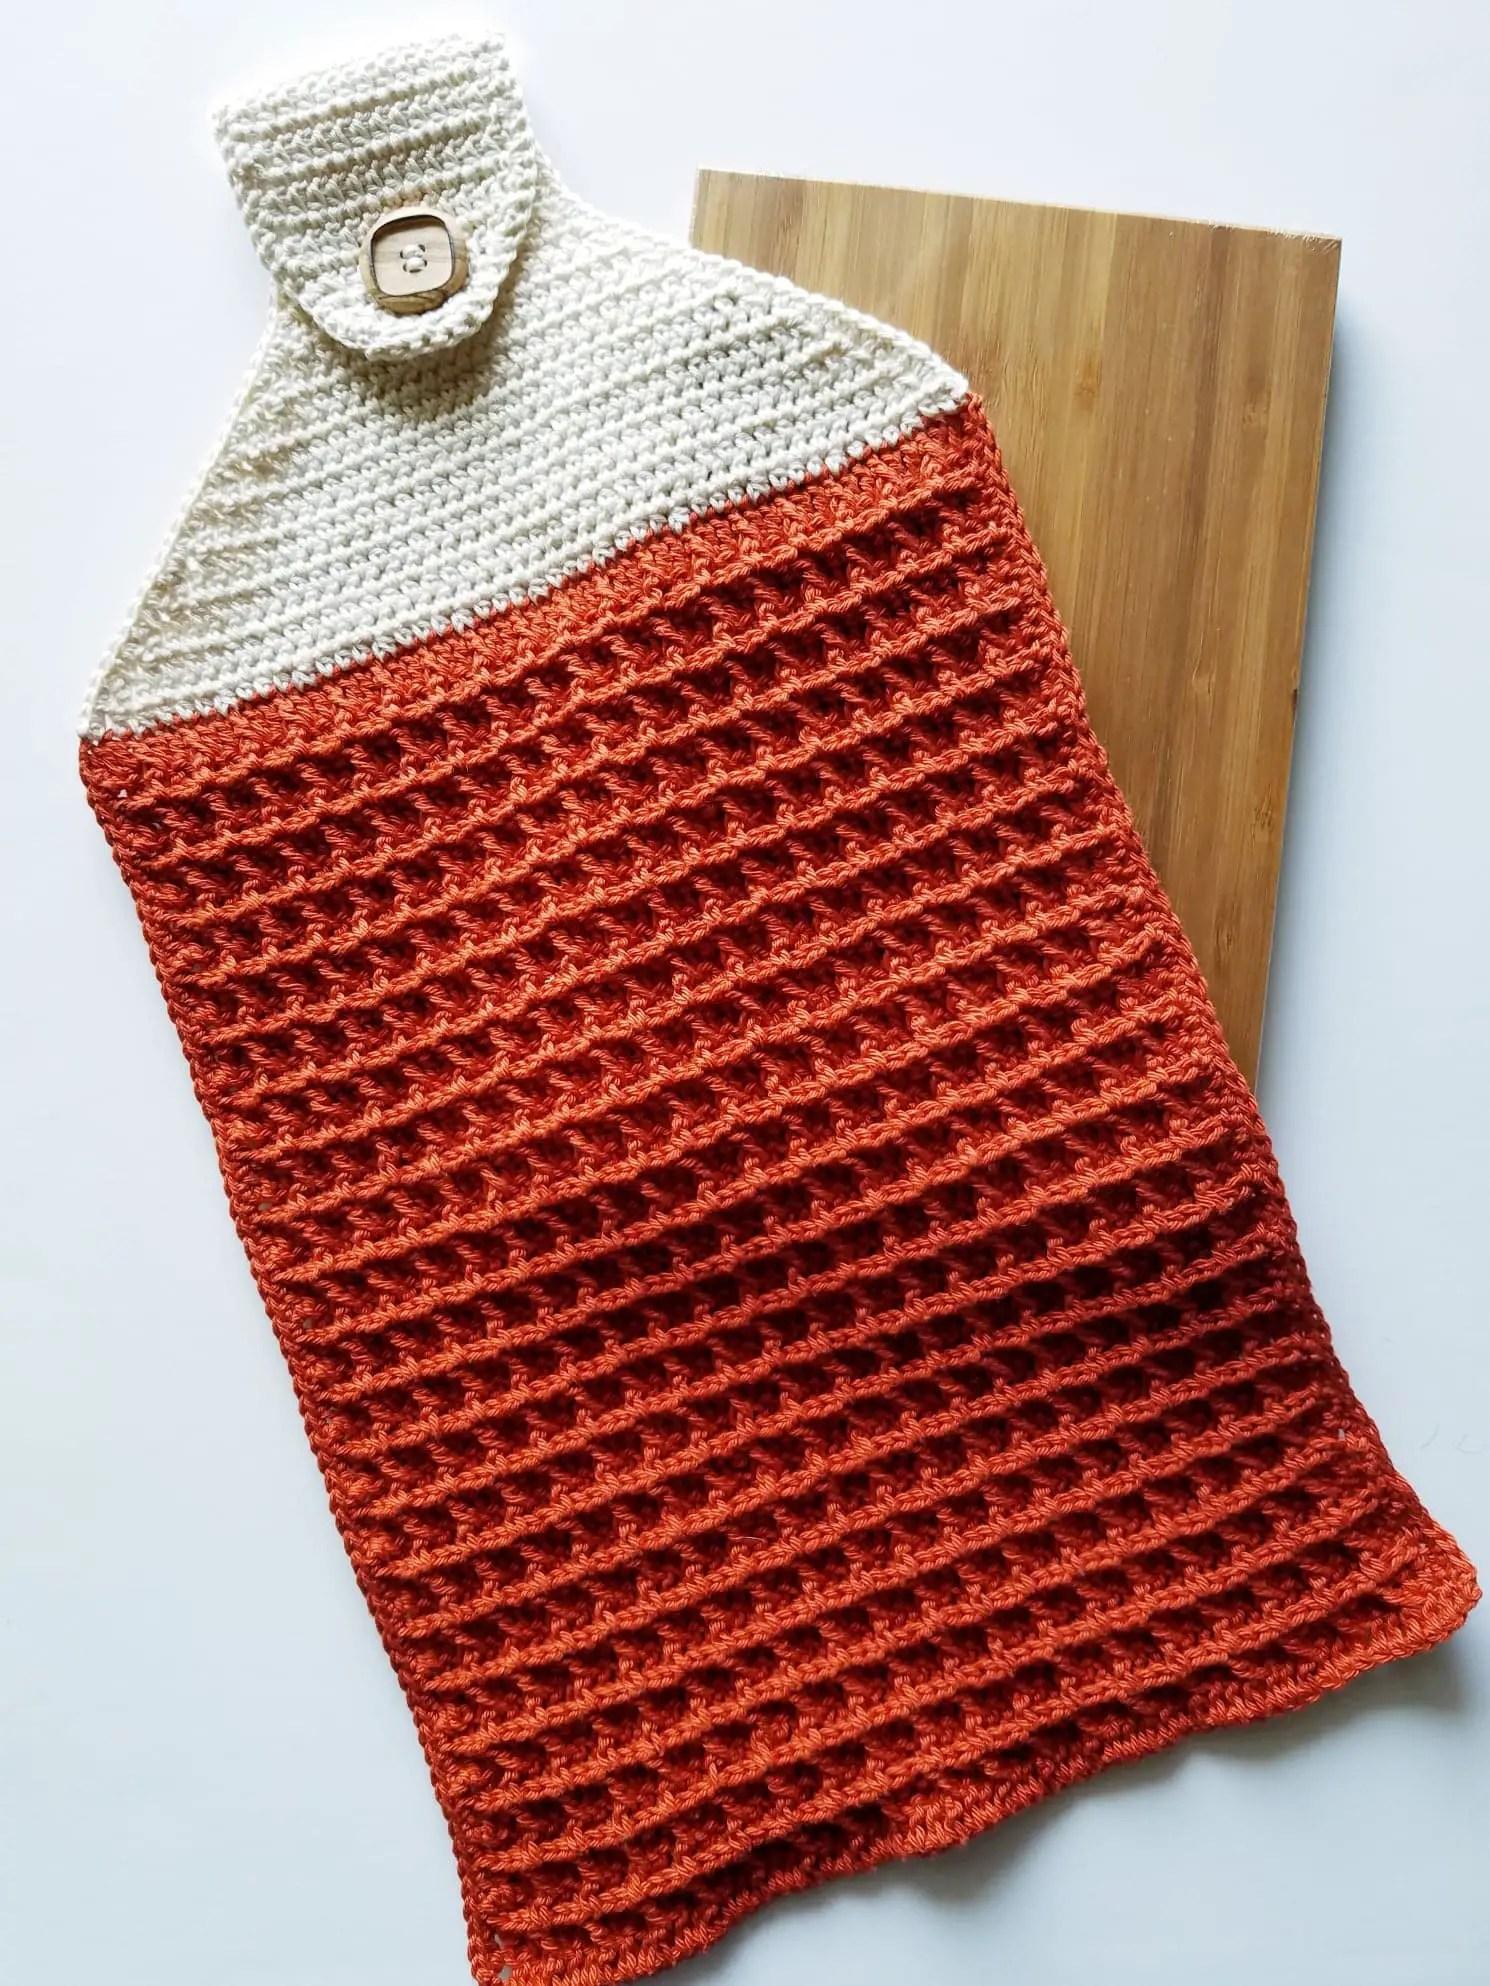 how to crochet kitchen towel